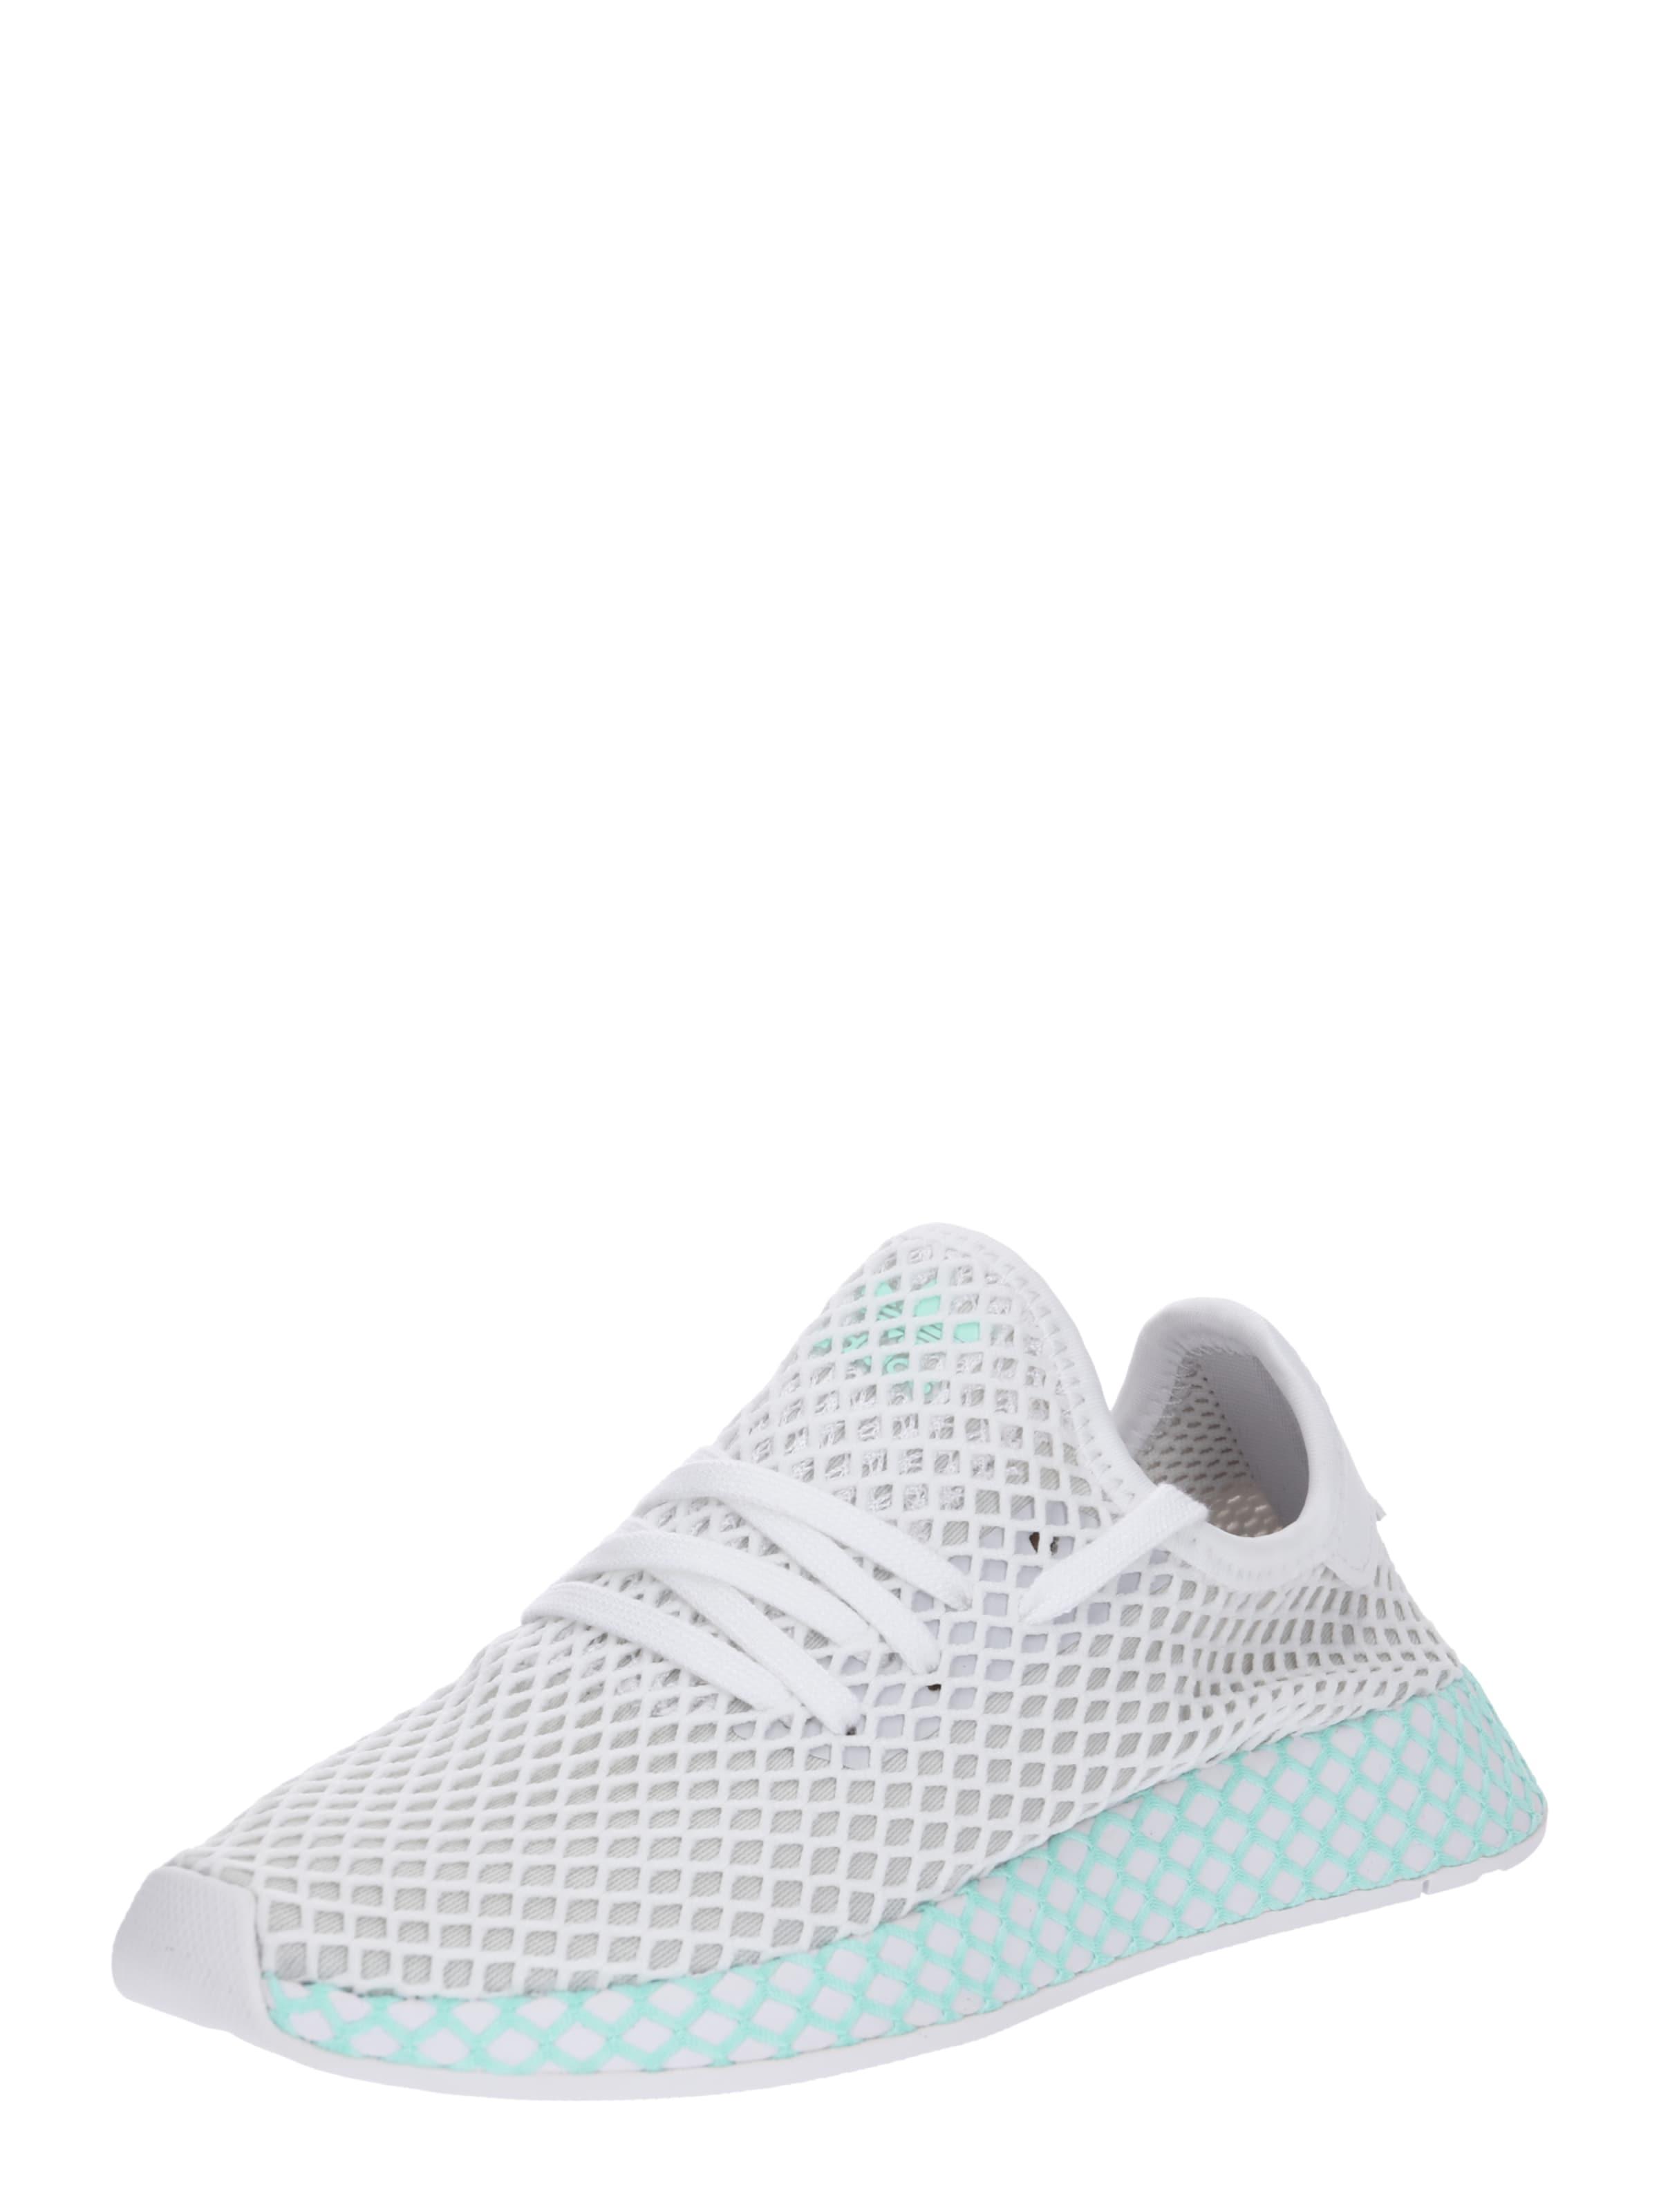 Sneaker MintWeiß 'deerupt In Adidas Runner' Originals 5RL4jA